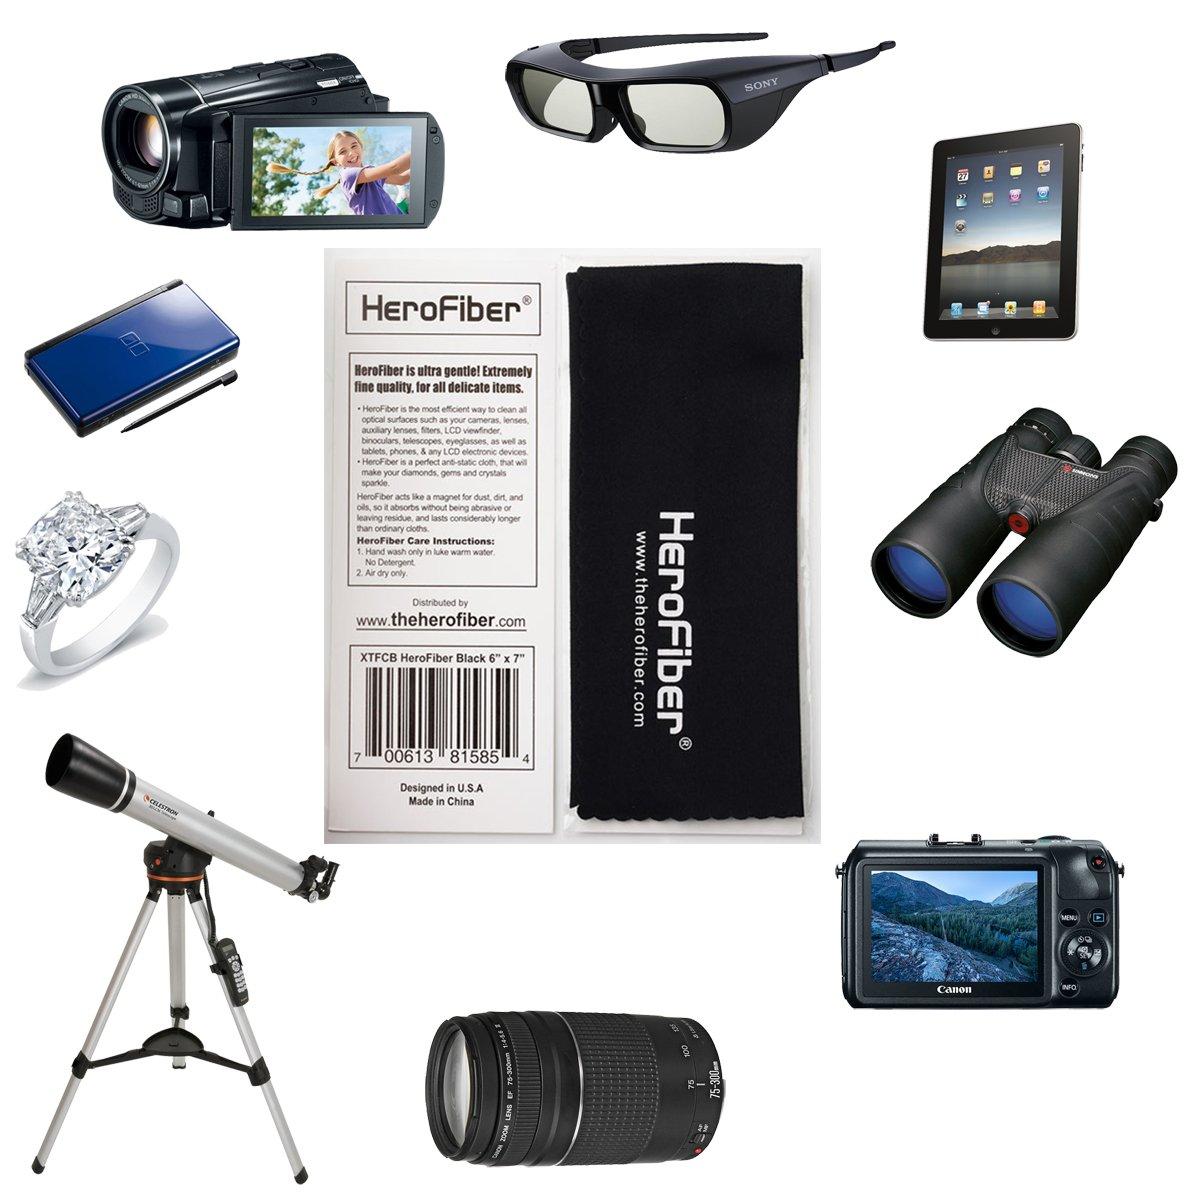 Amazon.com : Nikon COOLPIX L340 Digital Camera with 28x Zoom & Full HD Video (Black) International Version + 4 AA Batteries & Charger + 32GB Dlx Accessory Kit w/HeroFiber Cleaning Cloth